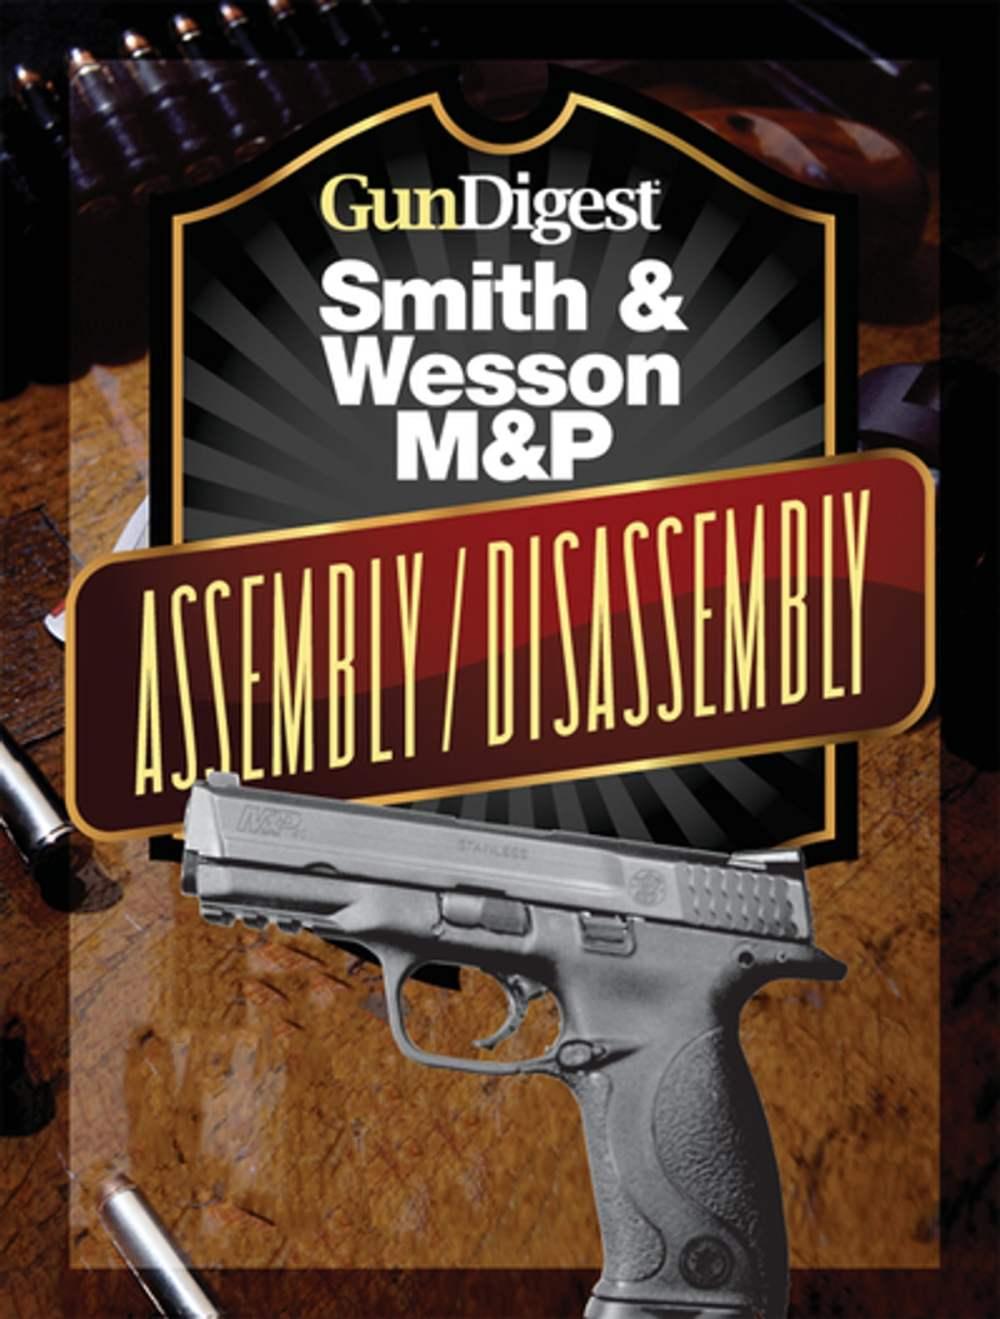 medium resolution of gun digest smith wesson m p assembly disassembly instructions ebook by j b wood 9781440231759 rakuten kobo